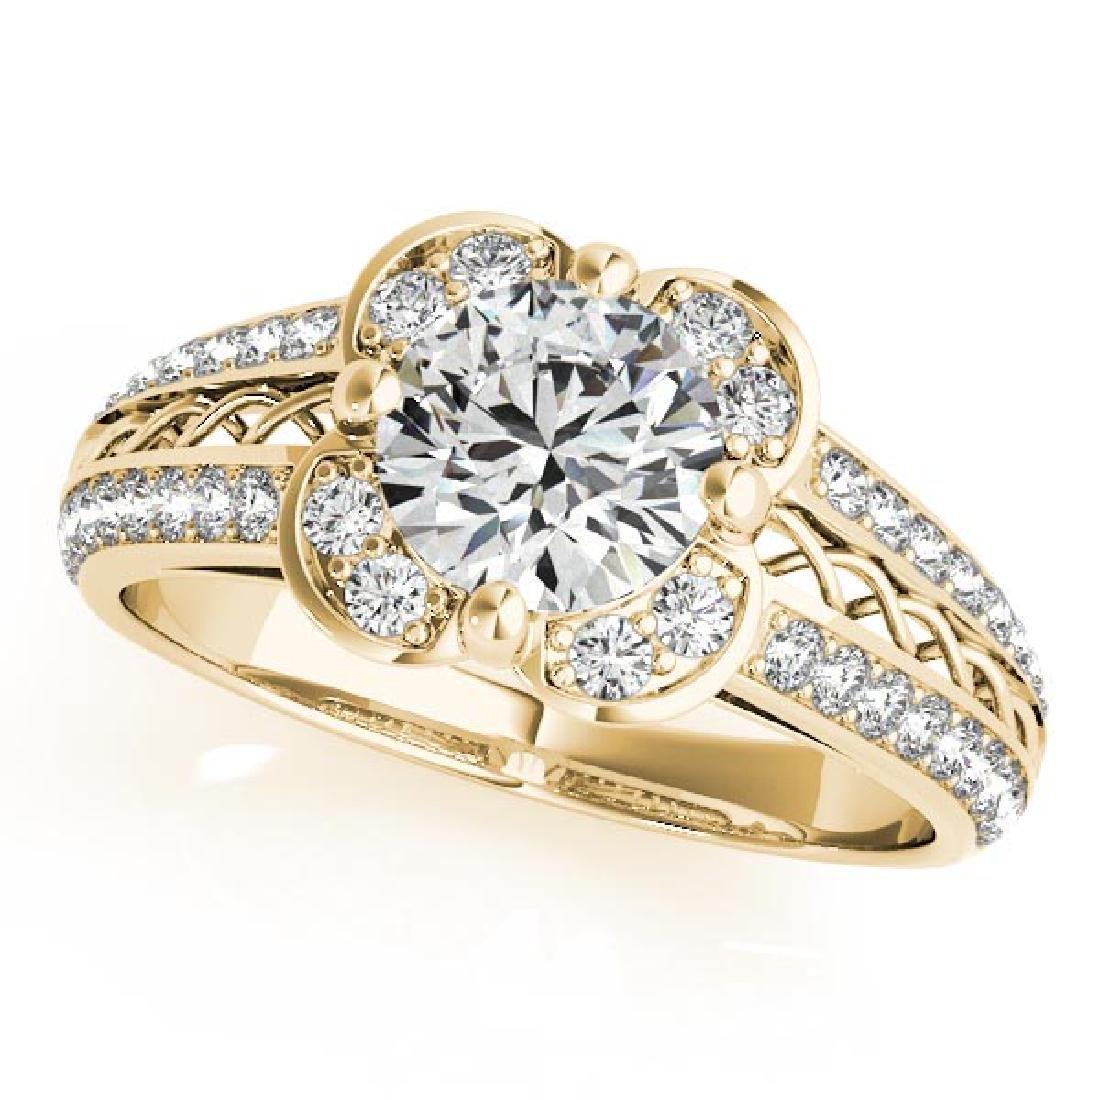 CERTIFIED 18K YELLOW GOLD .88 CT G-H/VS-SI1 DIAMOND HAL